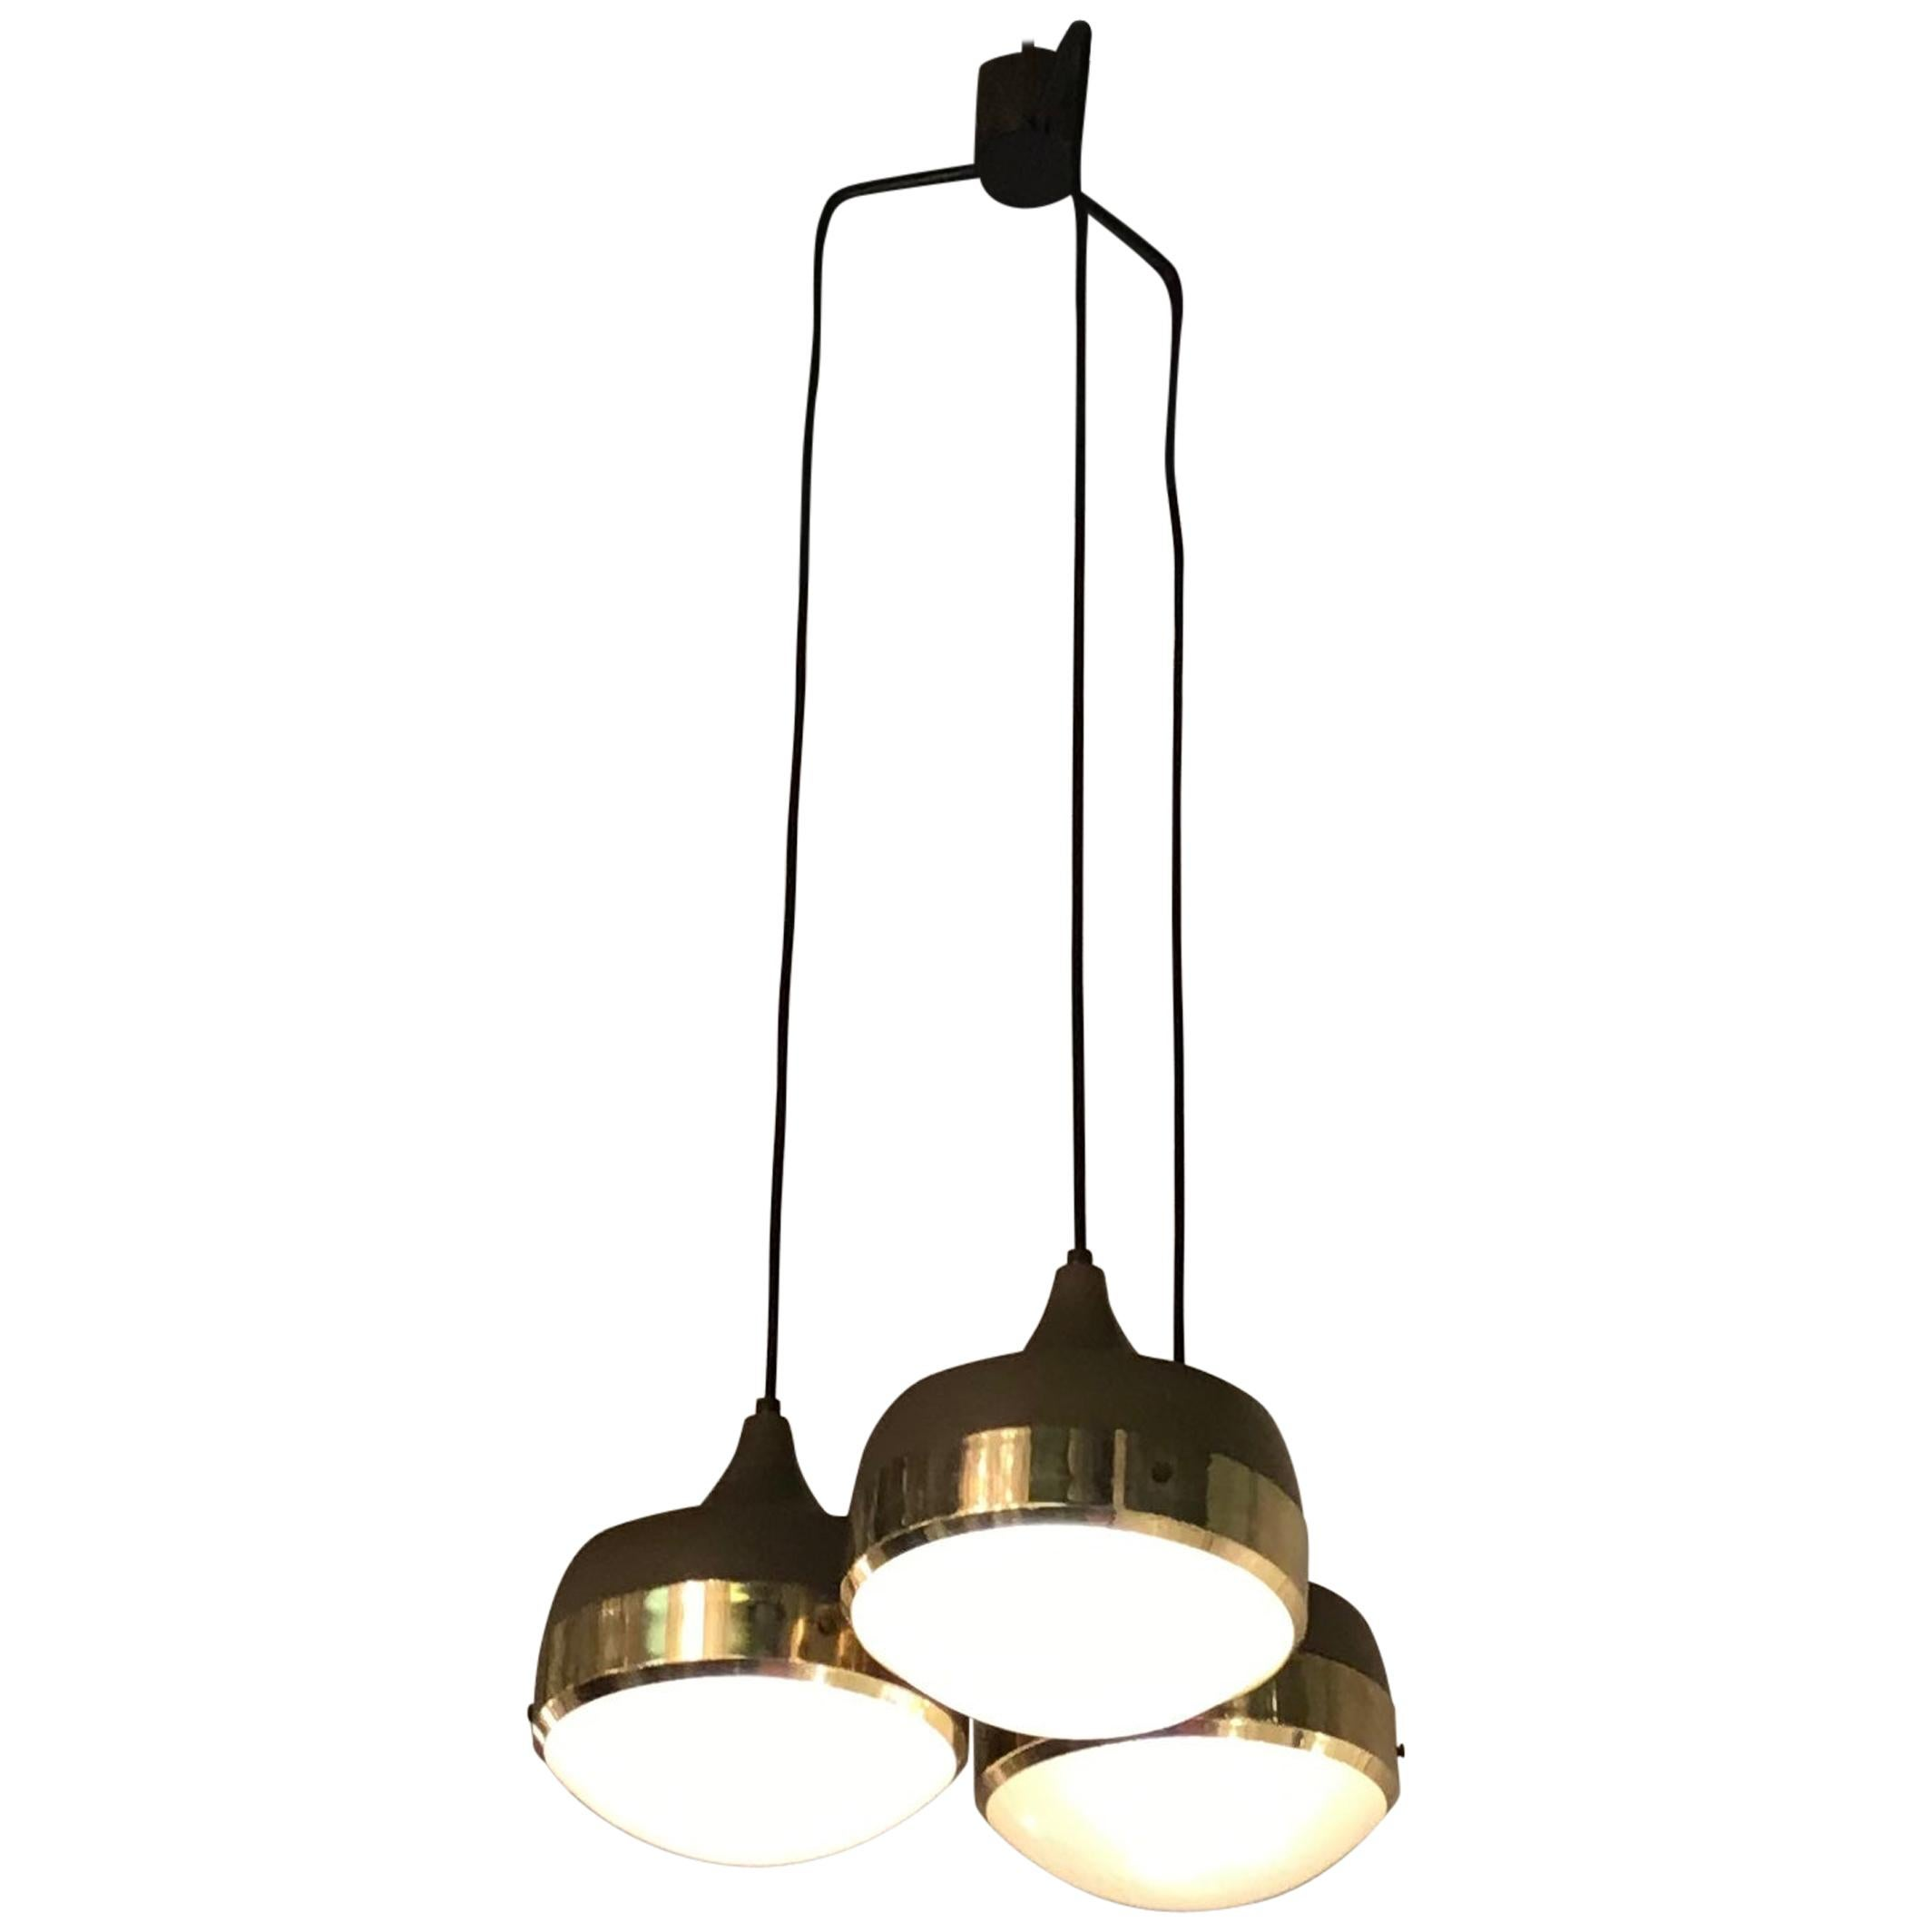 Stilnovo Style Chandelier Brass Glass Metal, 1960, Italy